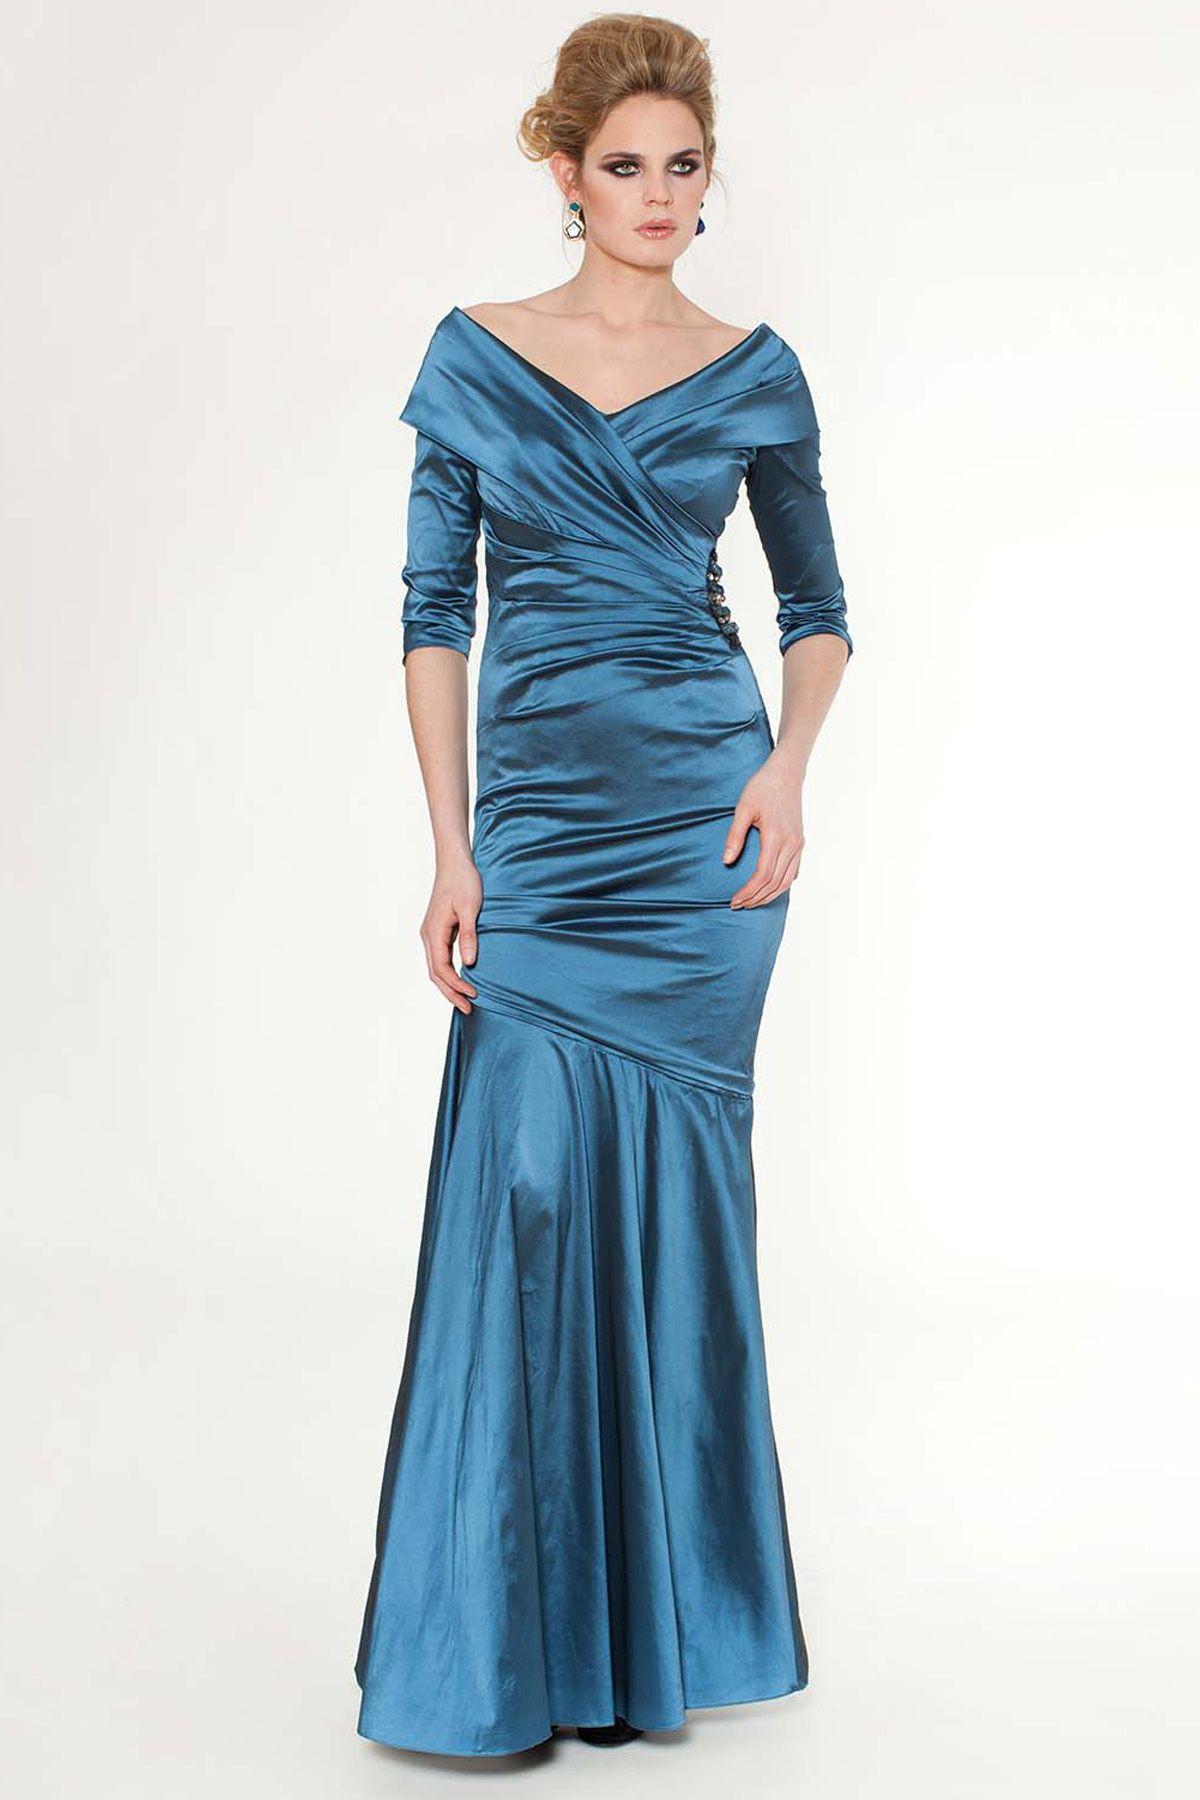 Portrait Collar Evening Dresses | shop evening gowns teal v neck ...